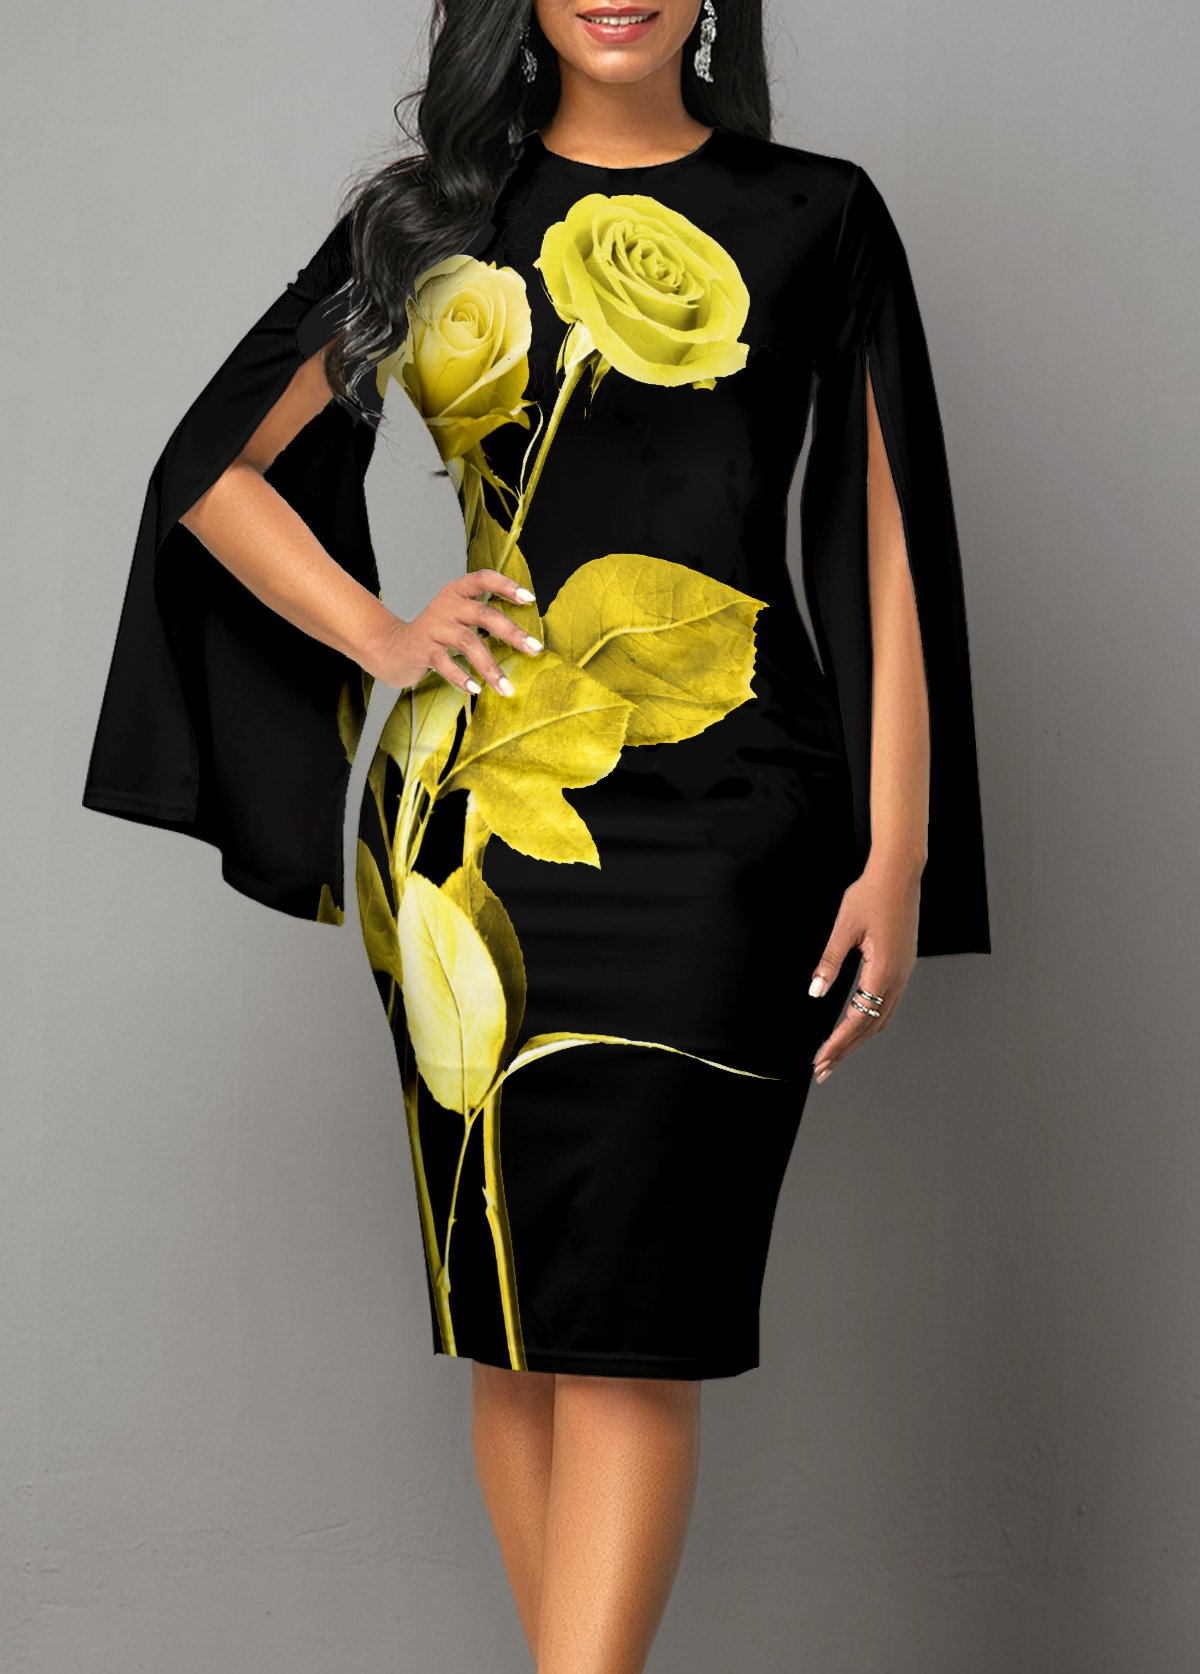 Floral Print Long Sleeve Round Neck Dress